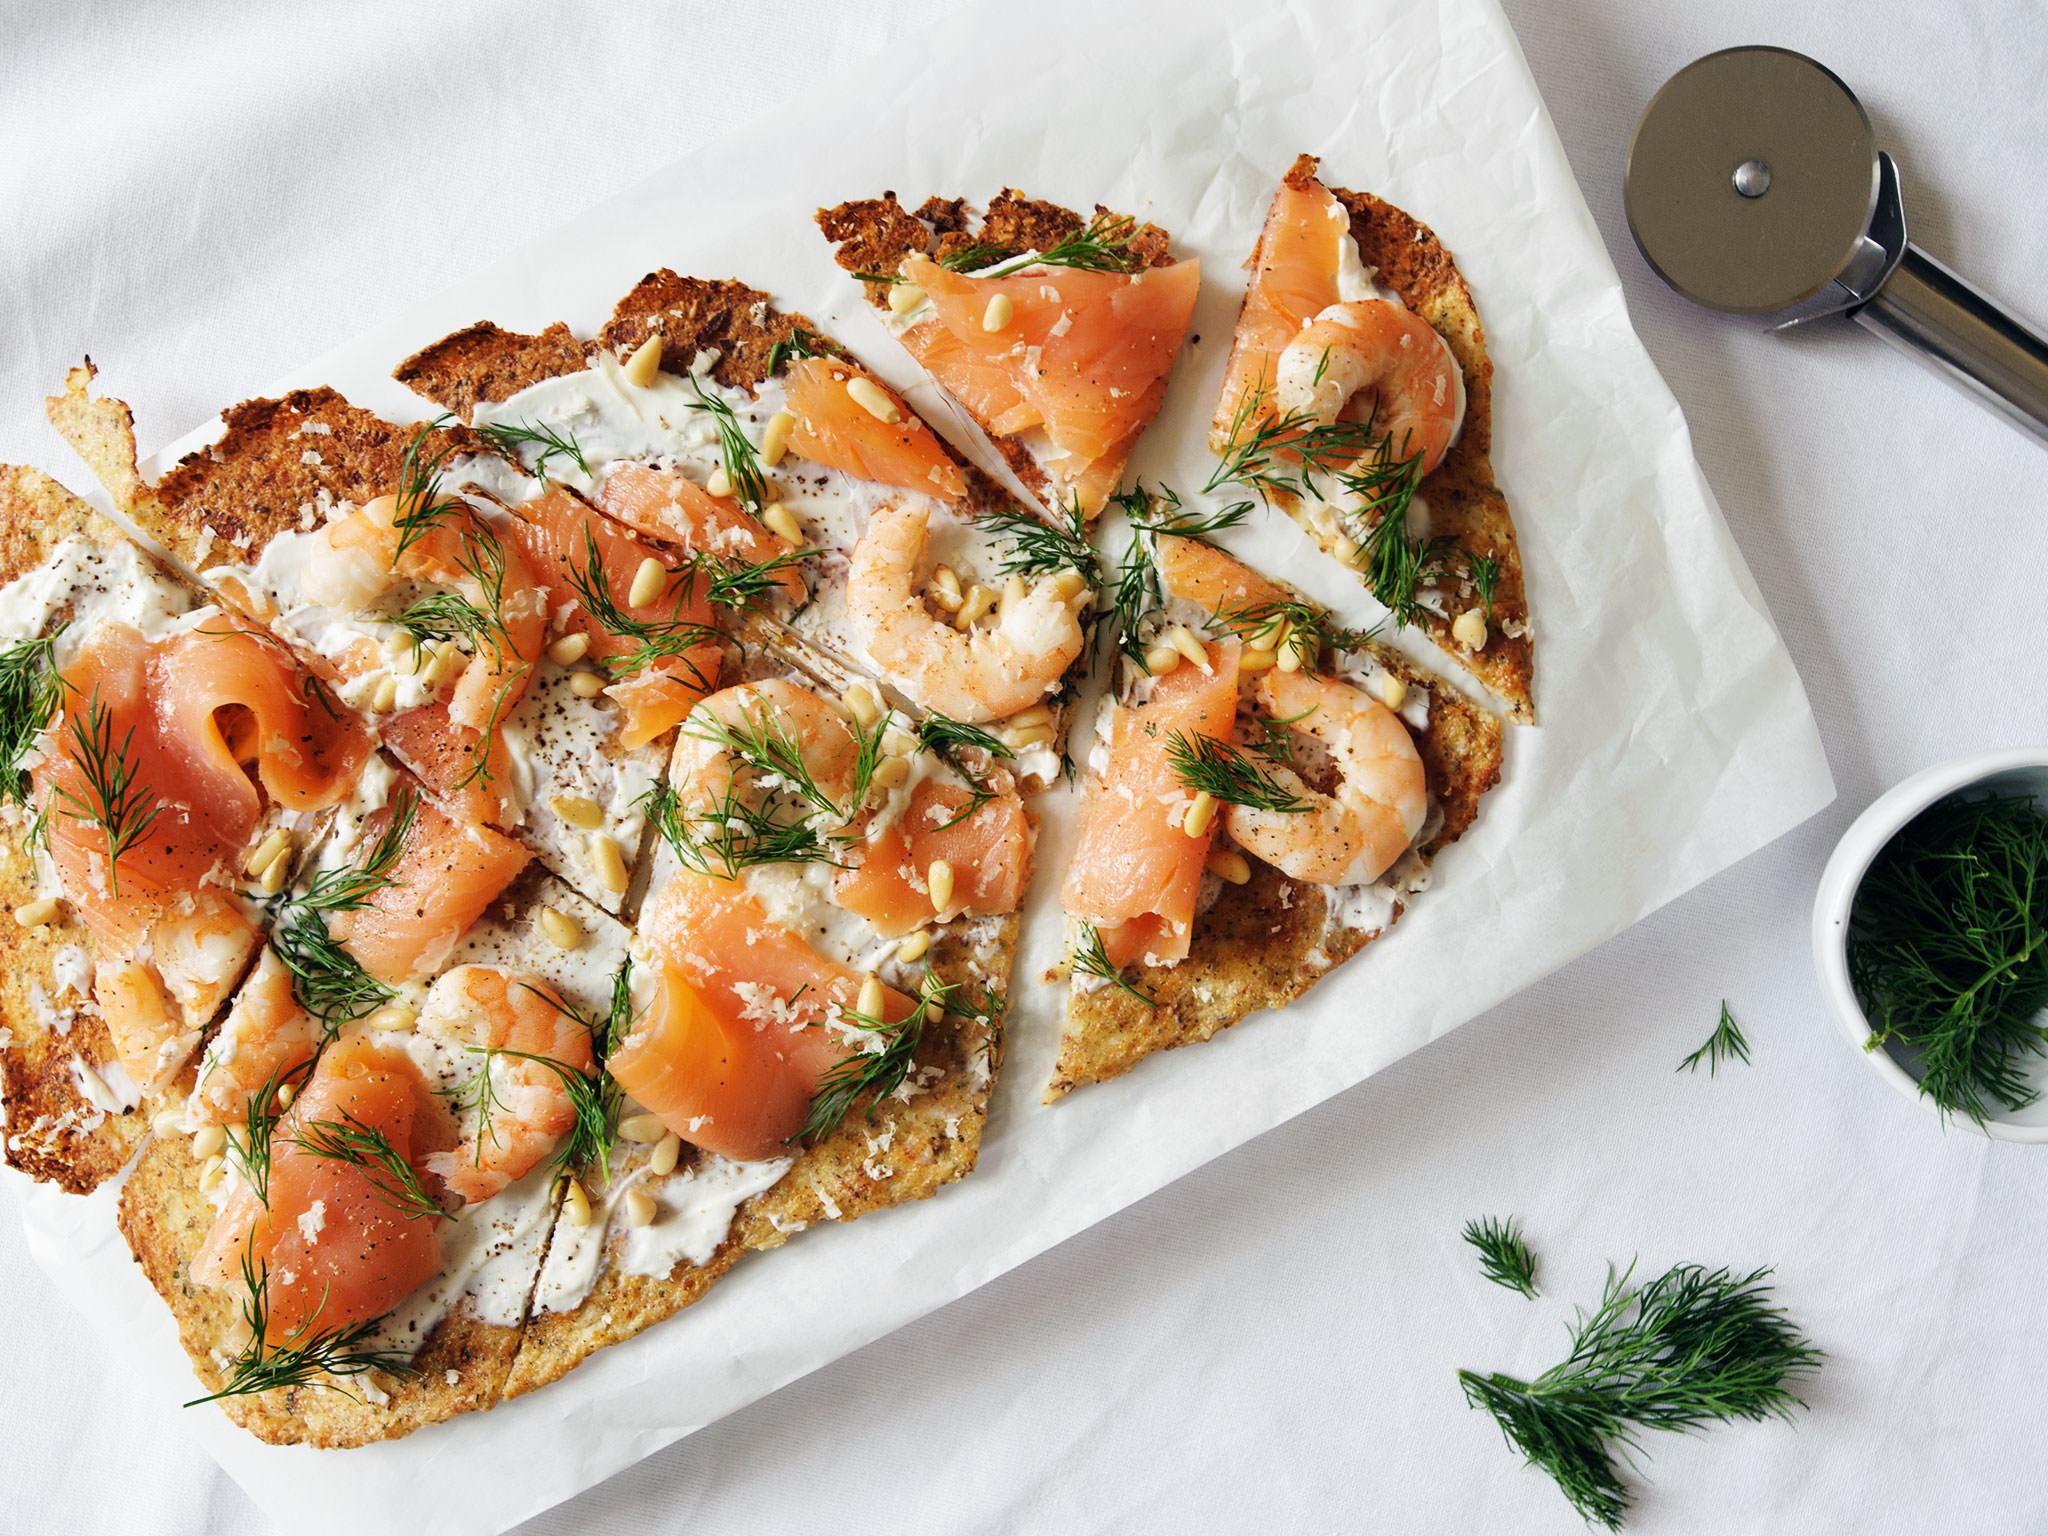 low carb pizza aus blumenkohl mit ger uchertem lachs rezepte kitchen stories. Black Bedroom Furniture Sets. Home Design Ideas